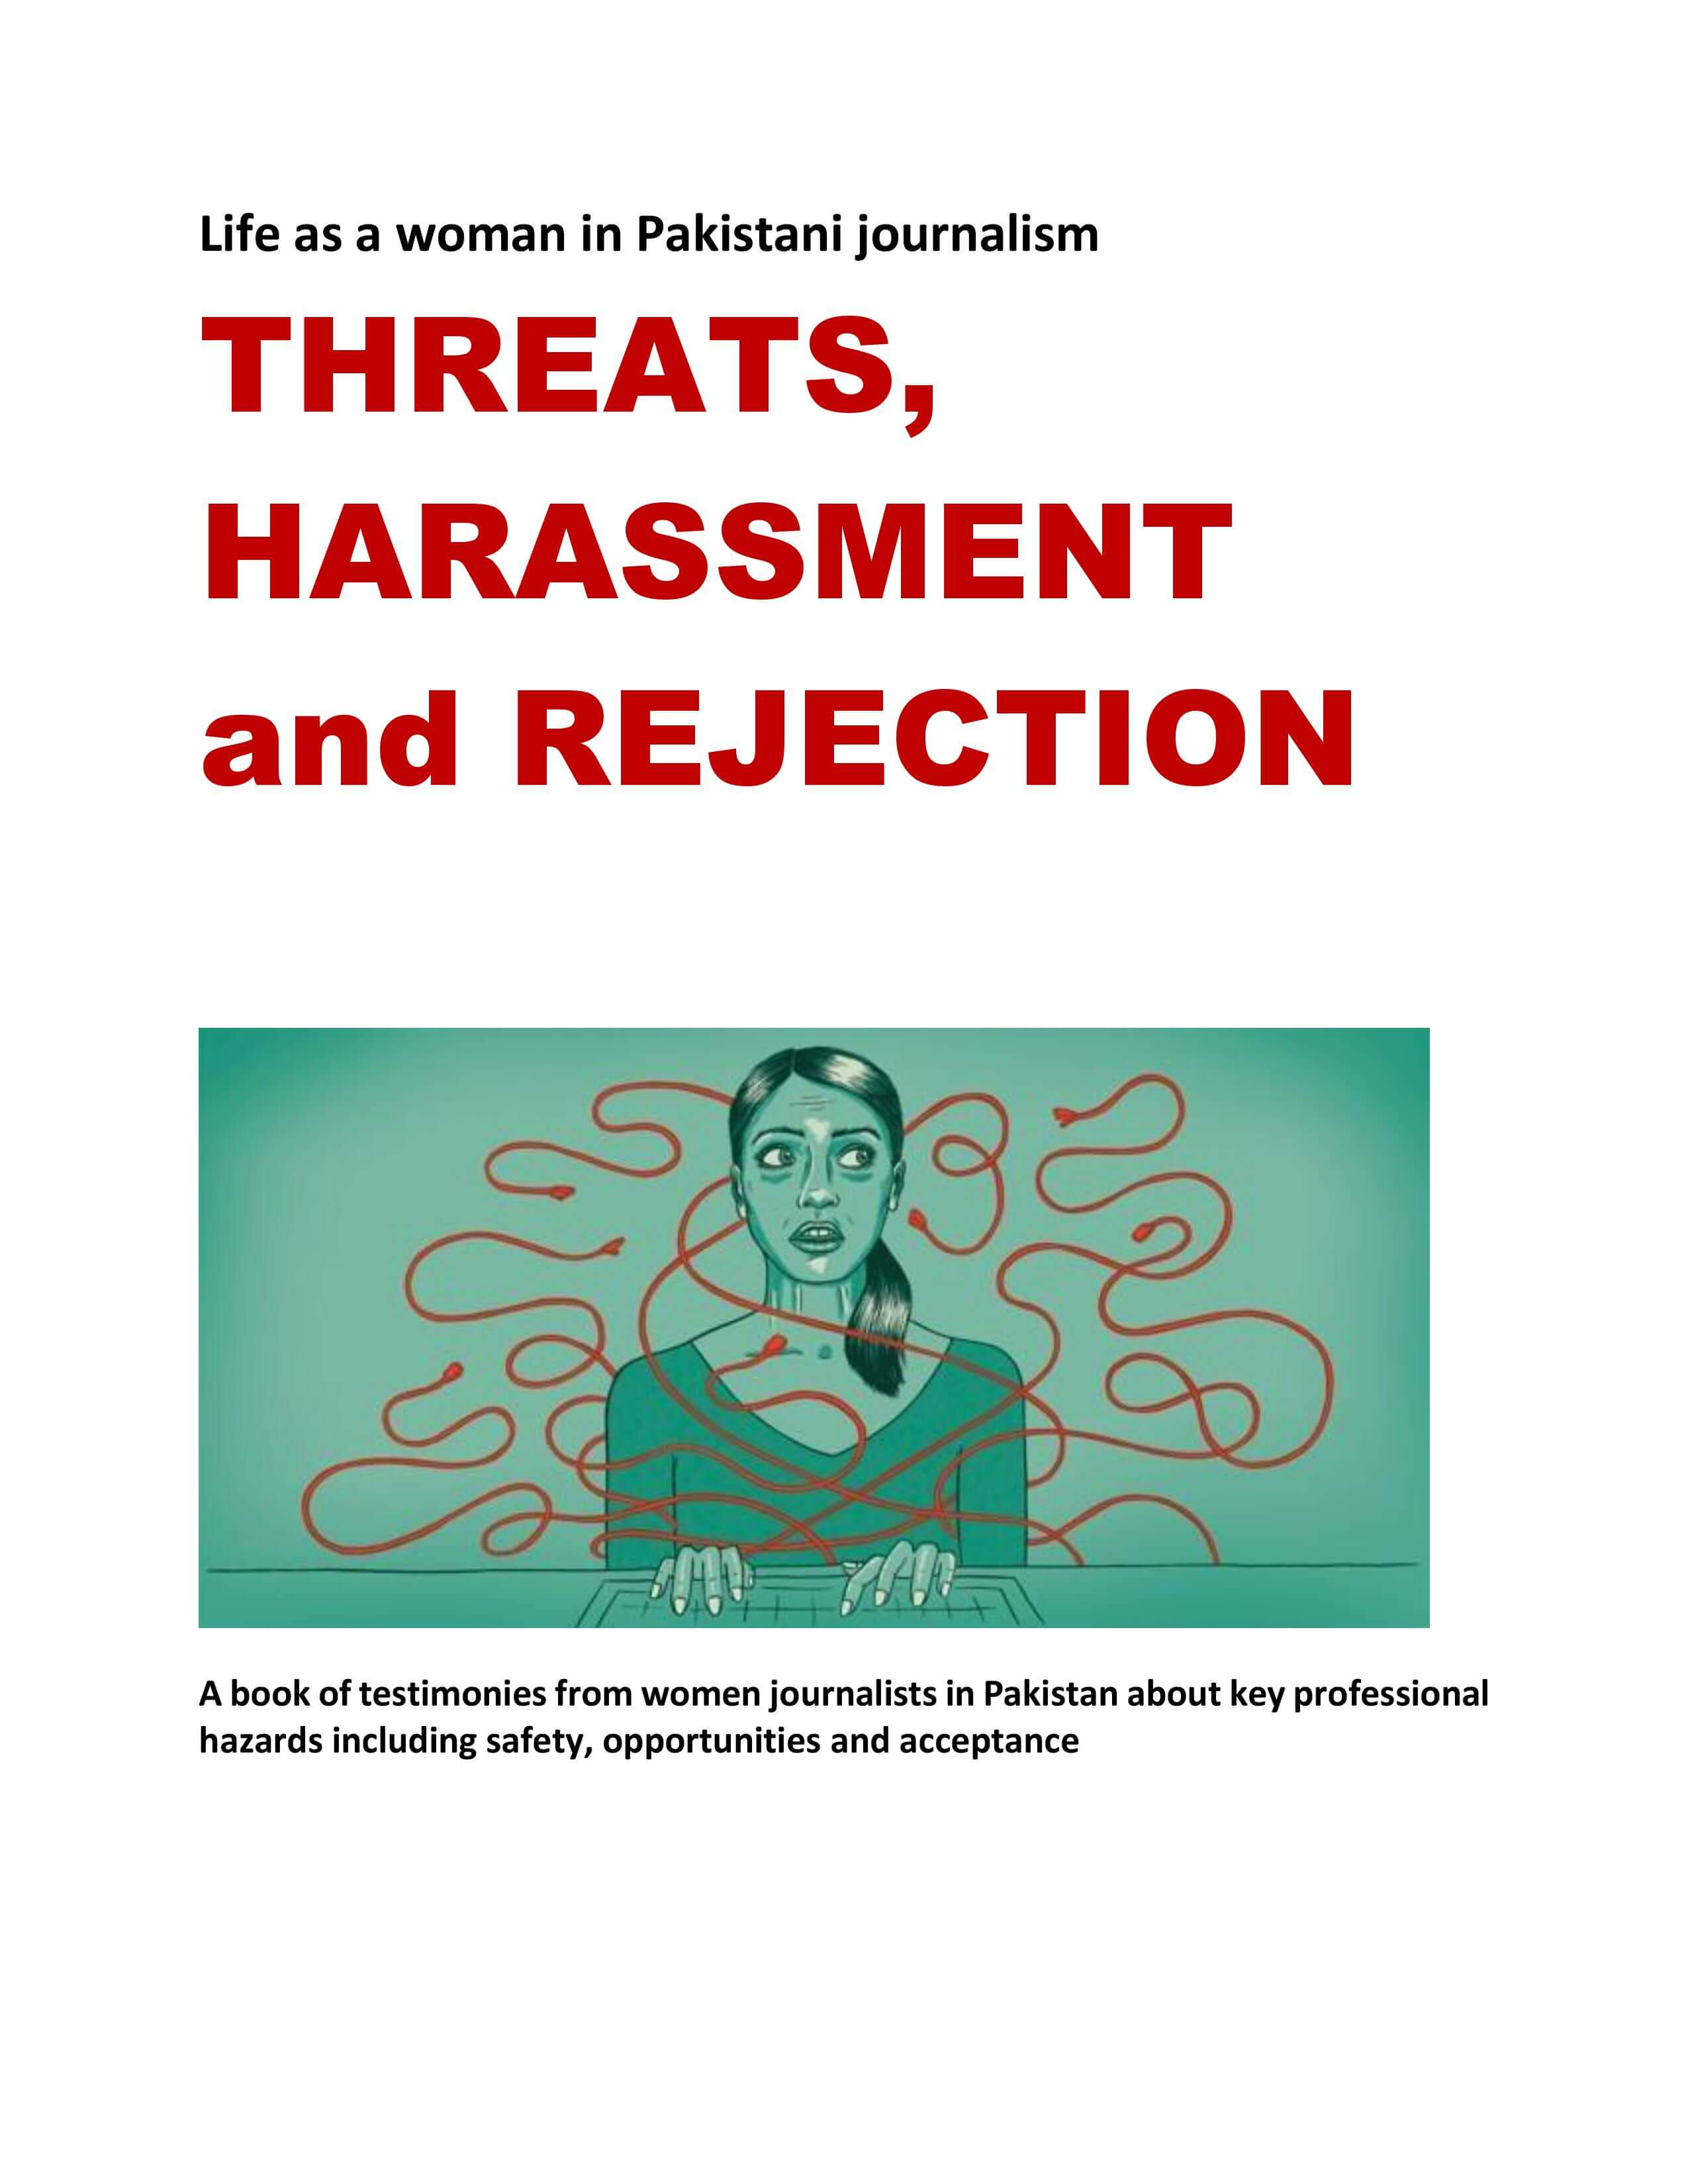 Sexual harassment stories in pakistan sick